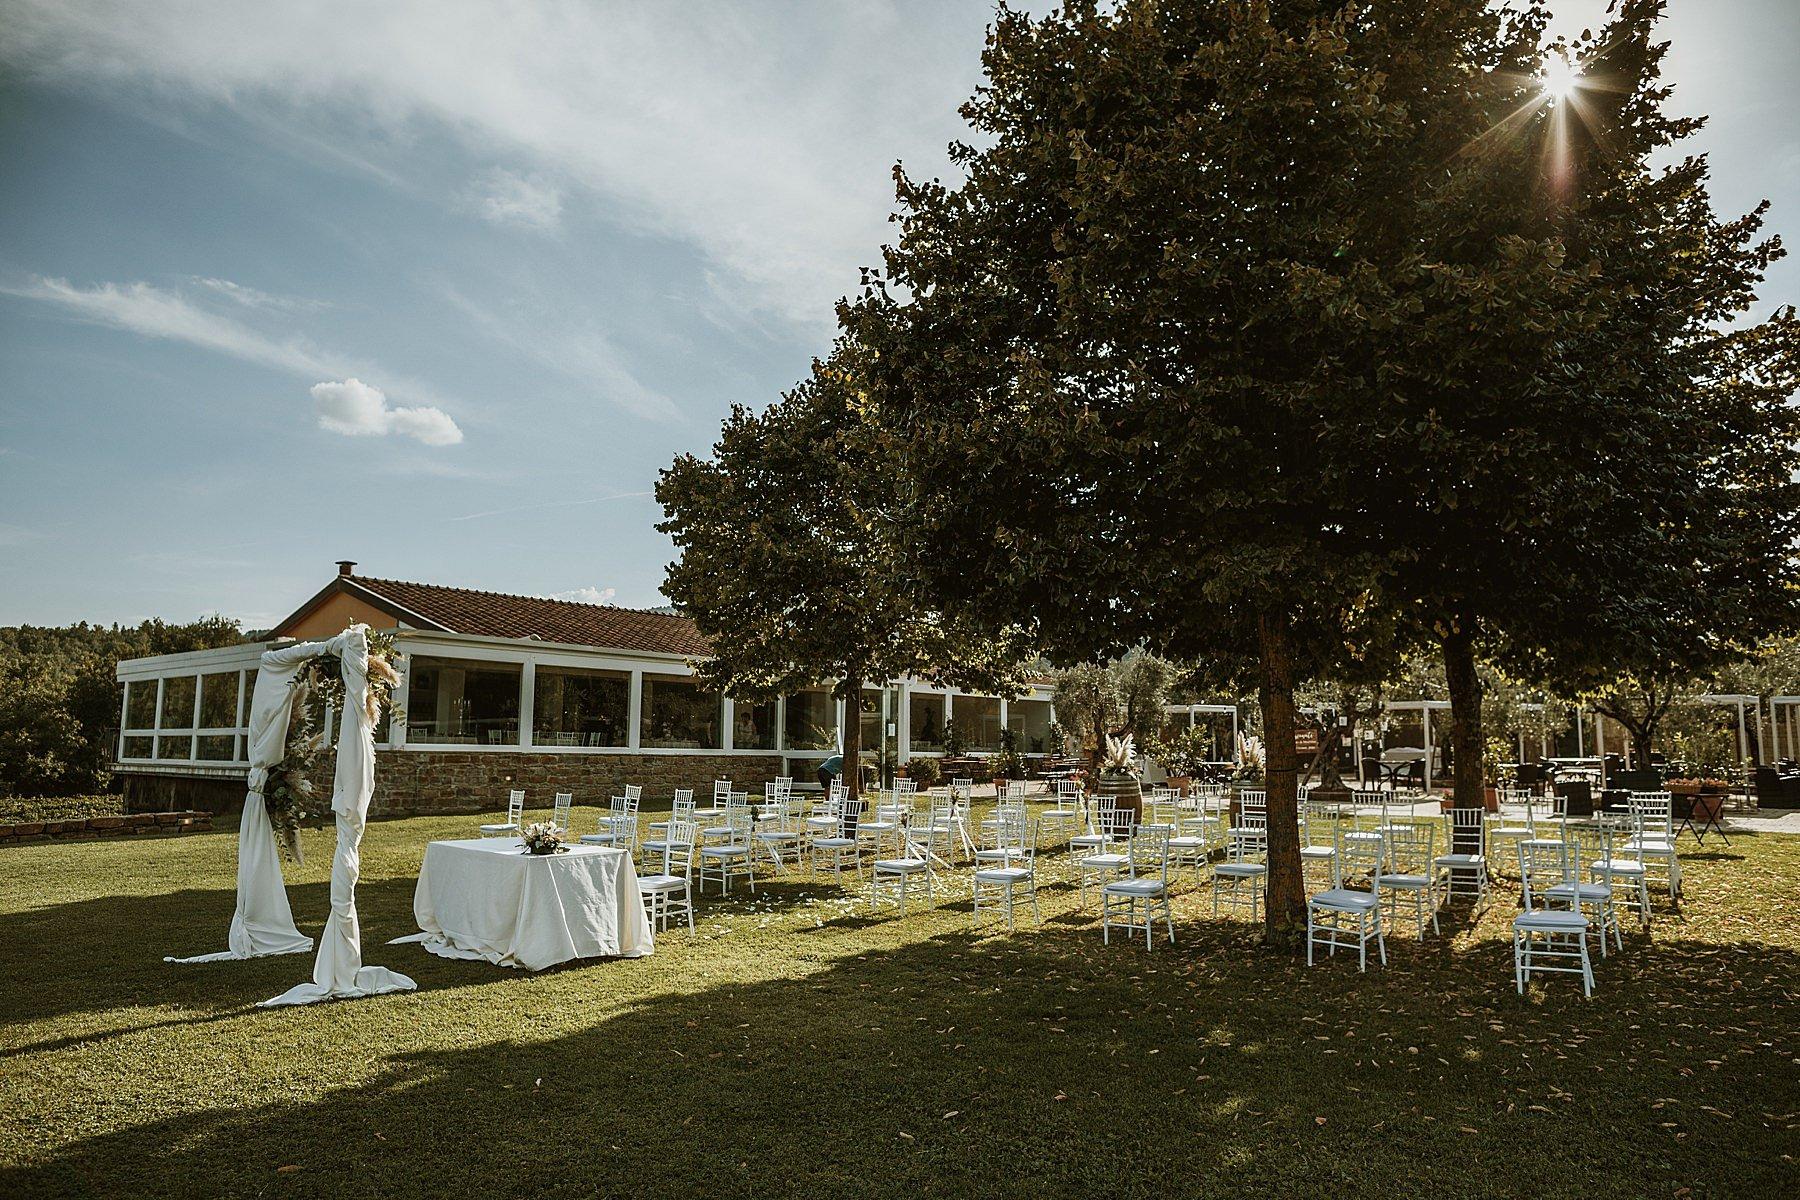 cerimonia civile a relais campiglioni montevarchi